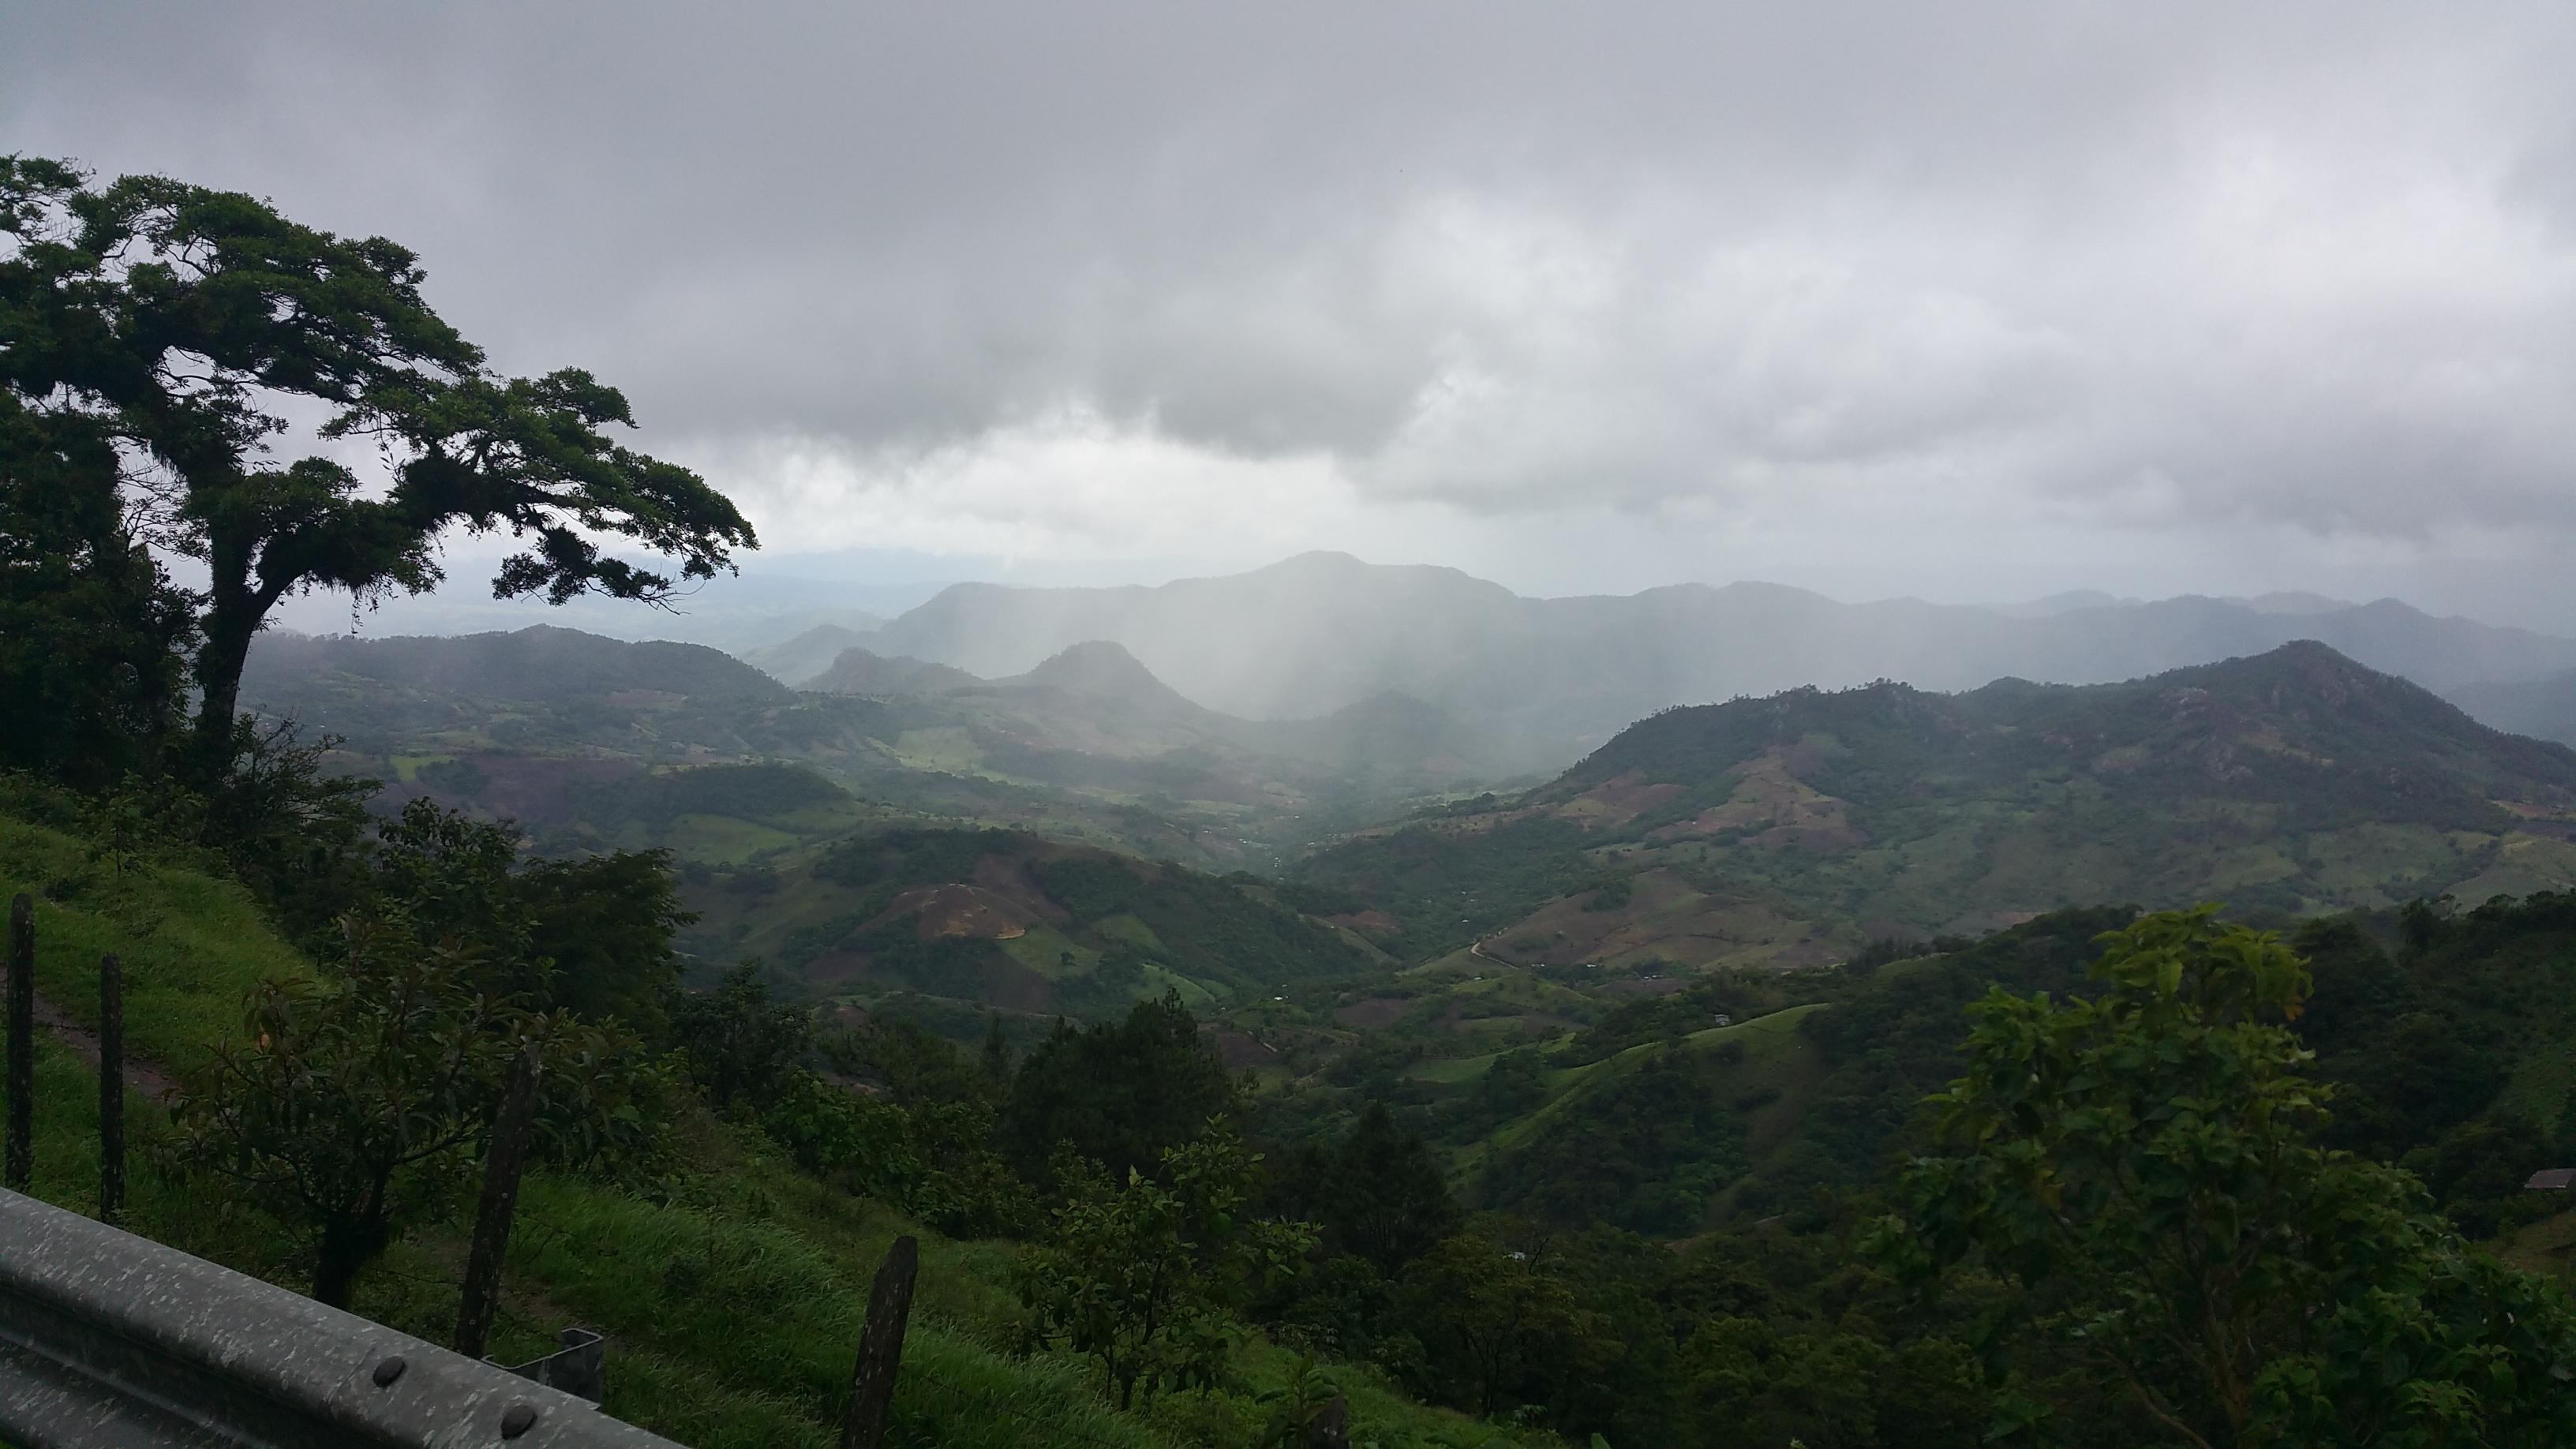 Nearly 4,000 feet above sea level, rainy season was in full swing in El Mojon, NI.